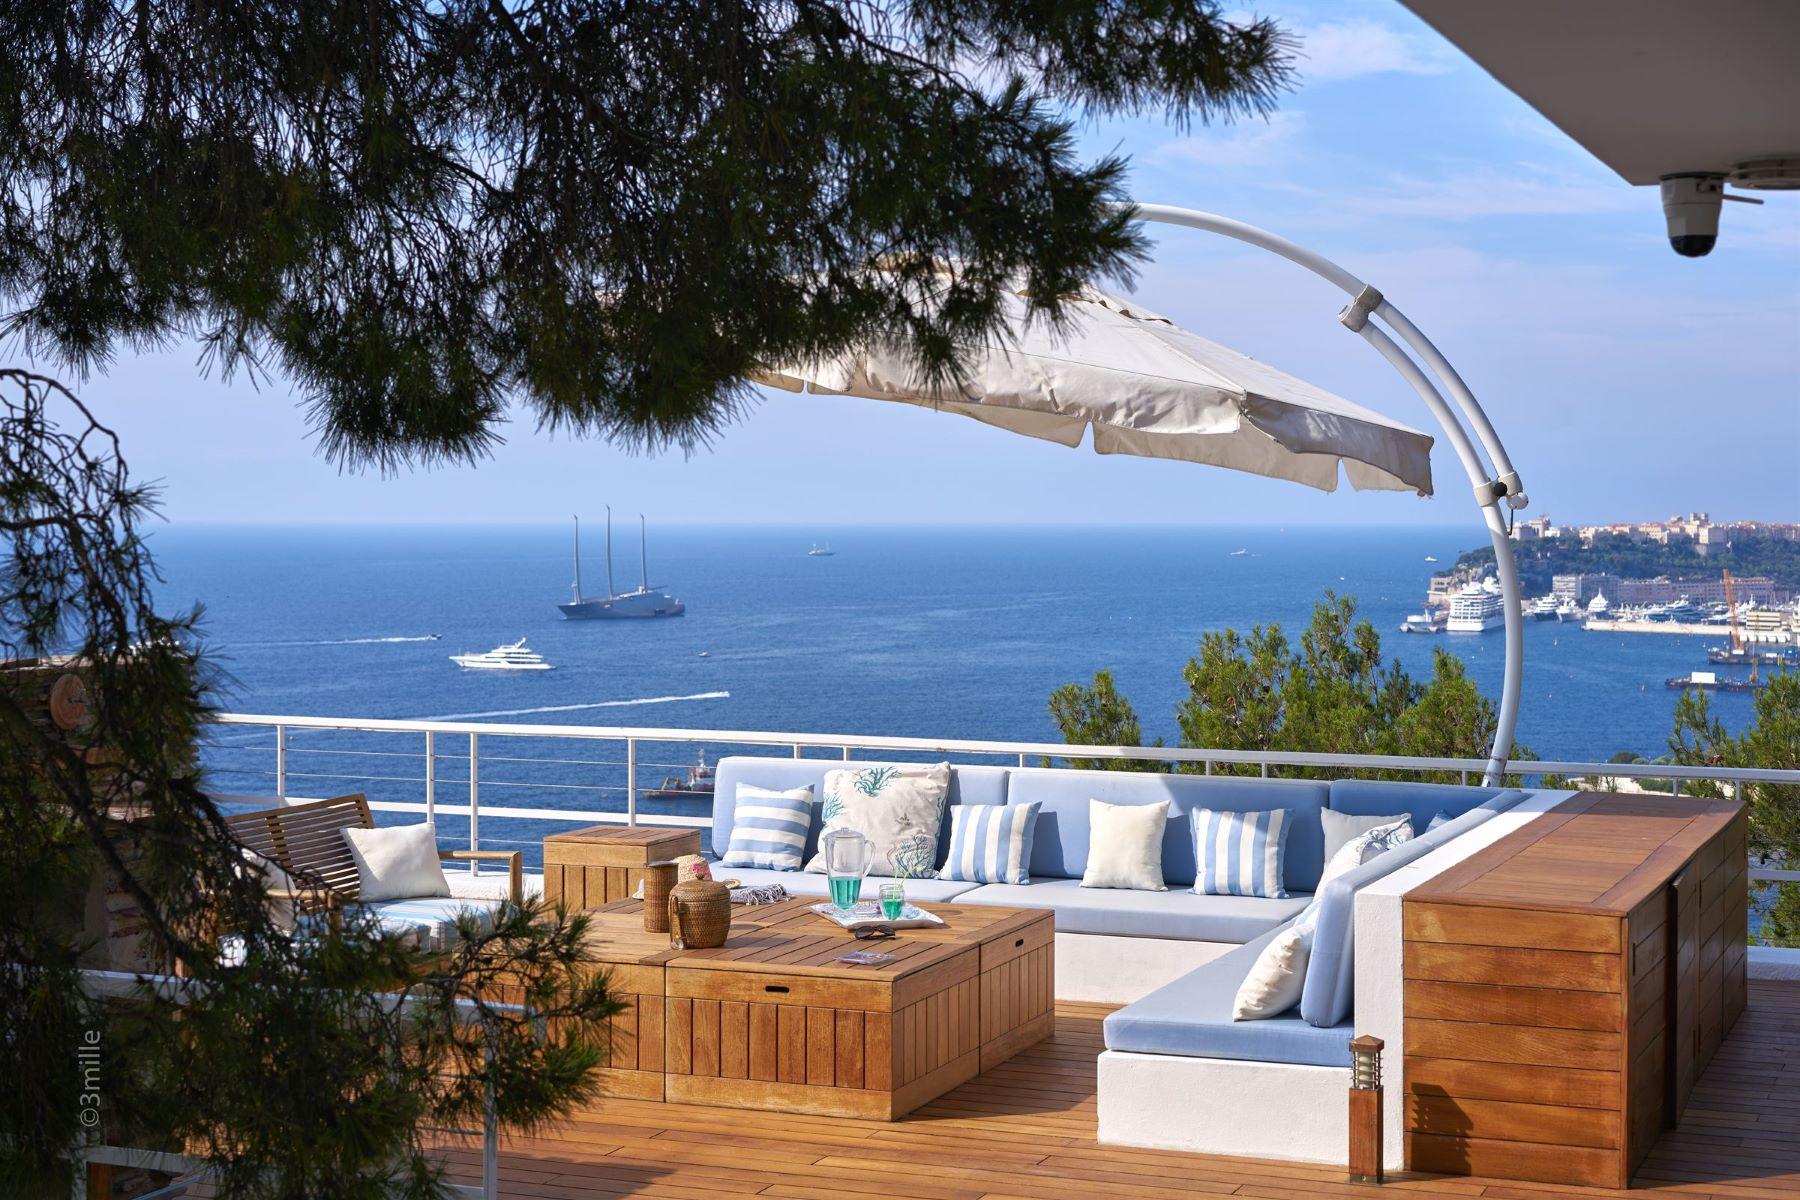 Single Family Homes for Sale at Prestigious Property at the gates of Monaco - 747sq.m Roquebrune Cap Martin, Provence-Alpes-Cote D'Azur 06190 France